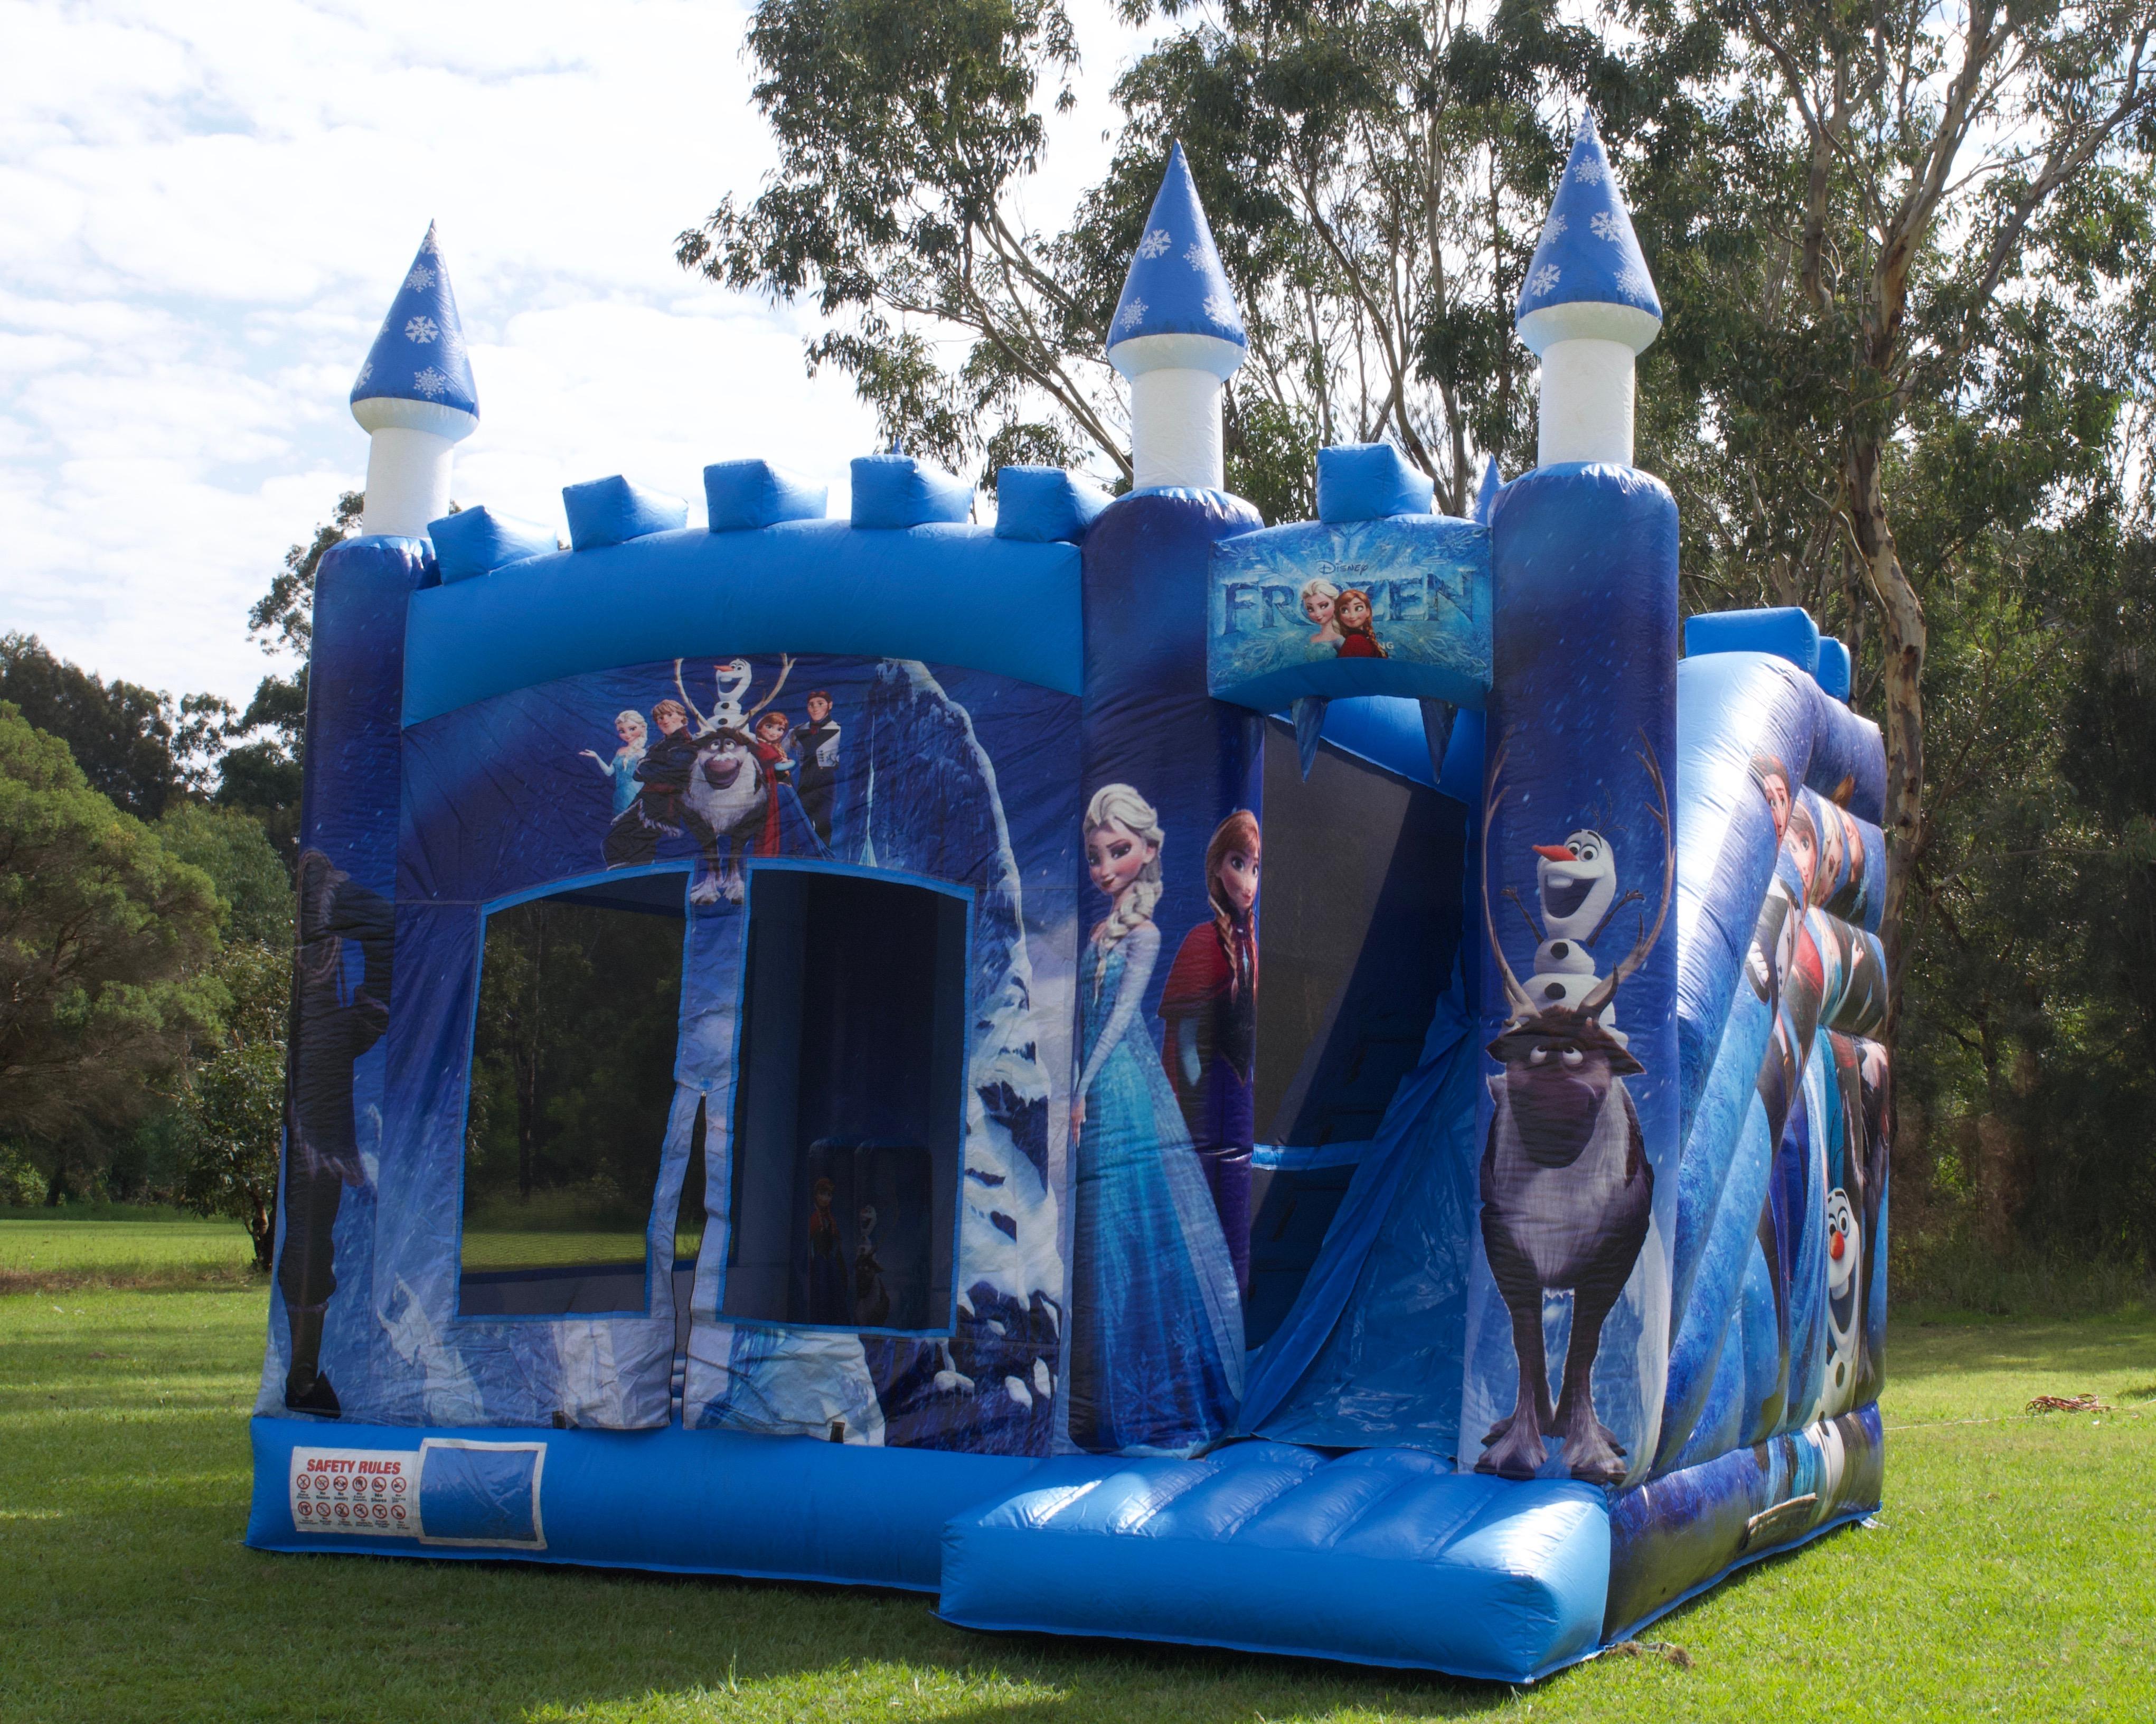 Frozen Tower Jumping Castle And Slide Wonderland Jumping